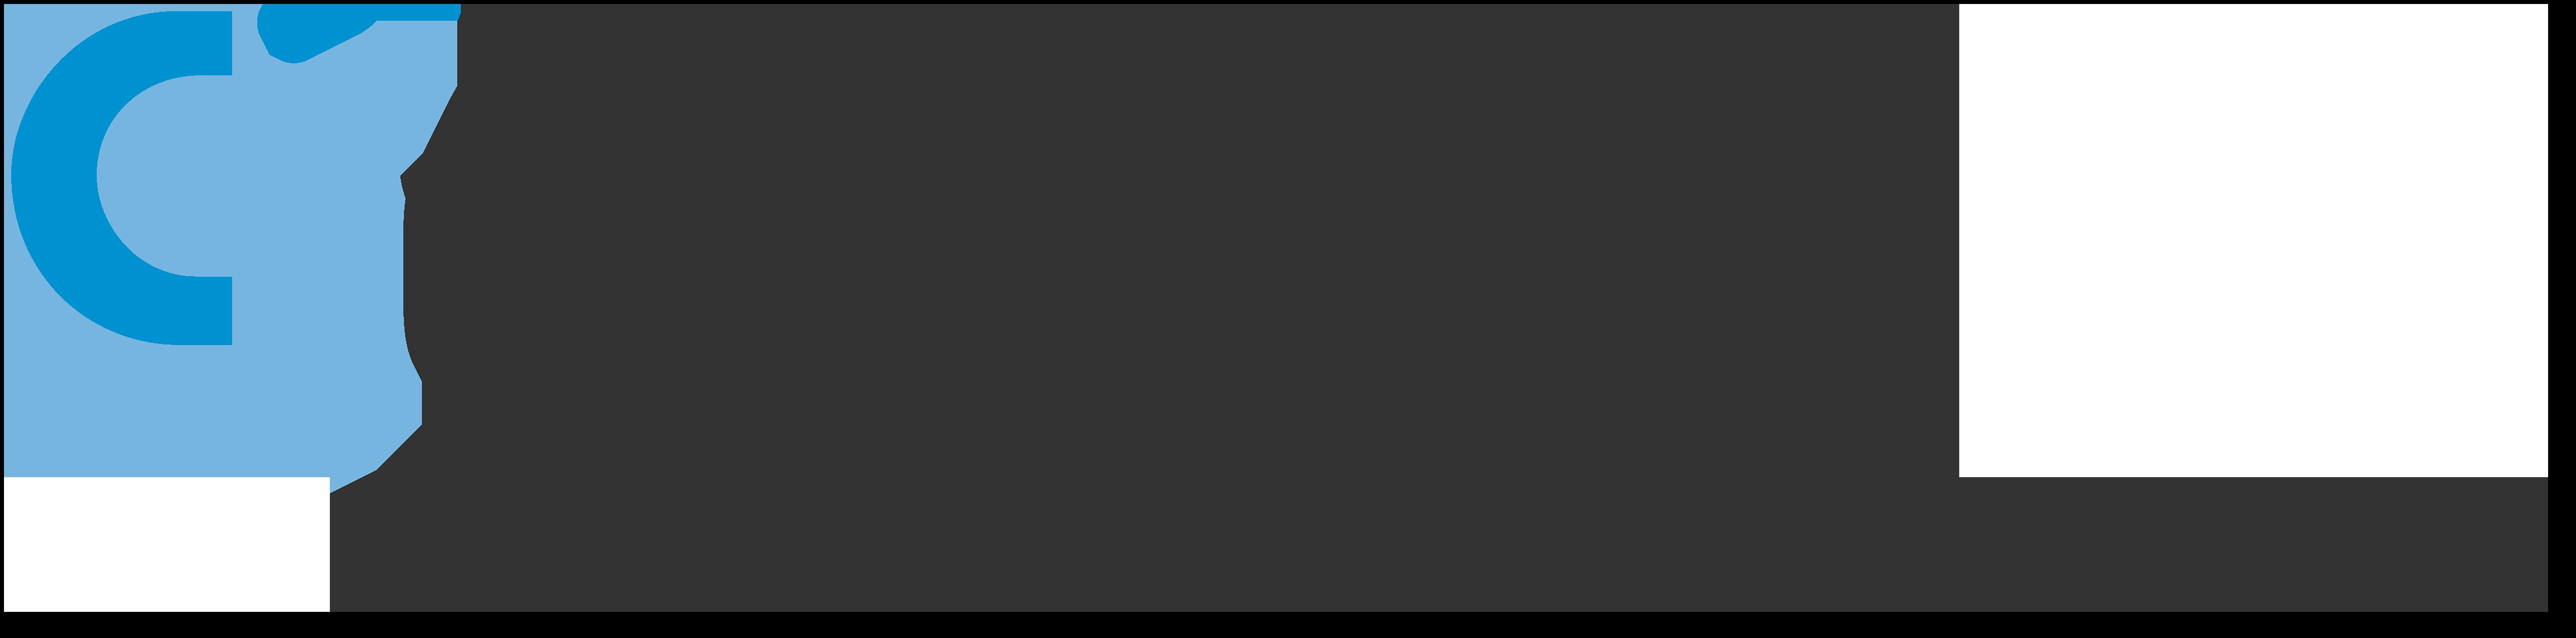 Celphone Schweiz GmbH